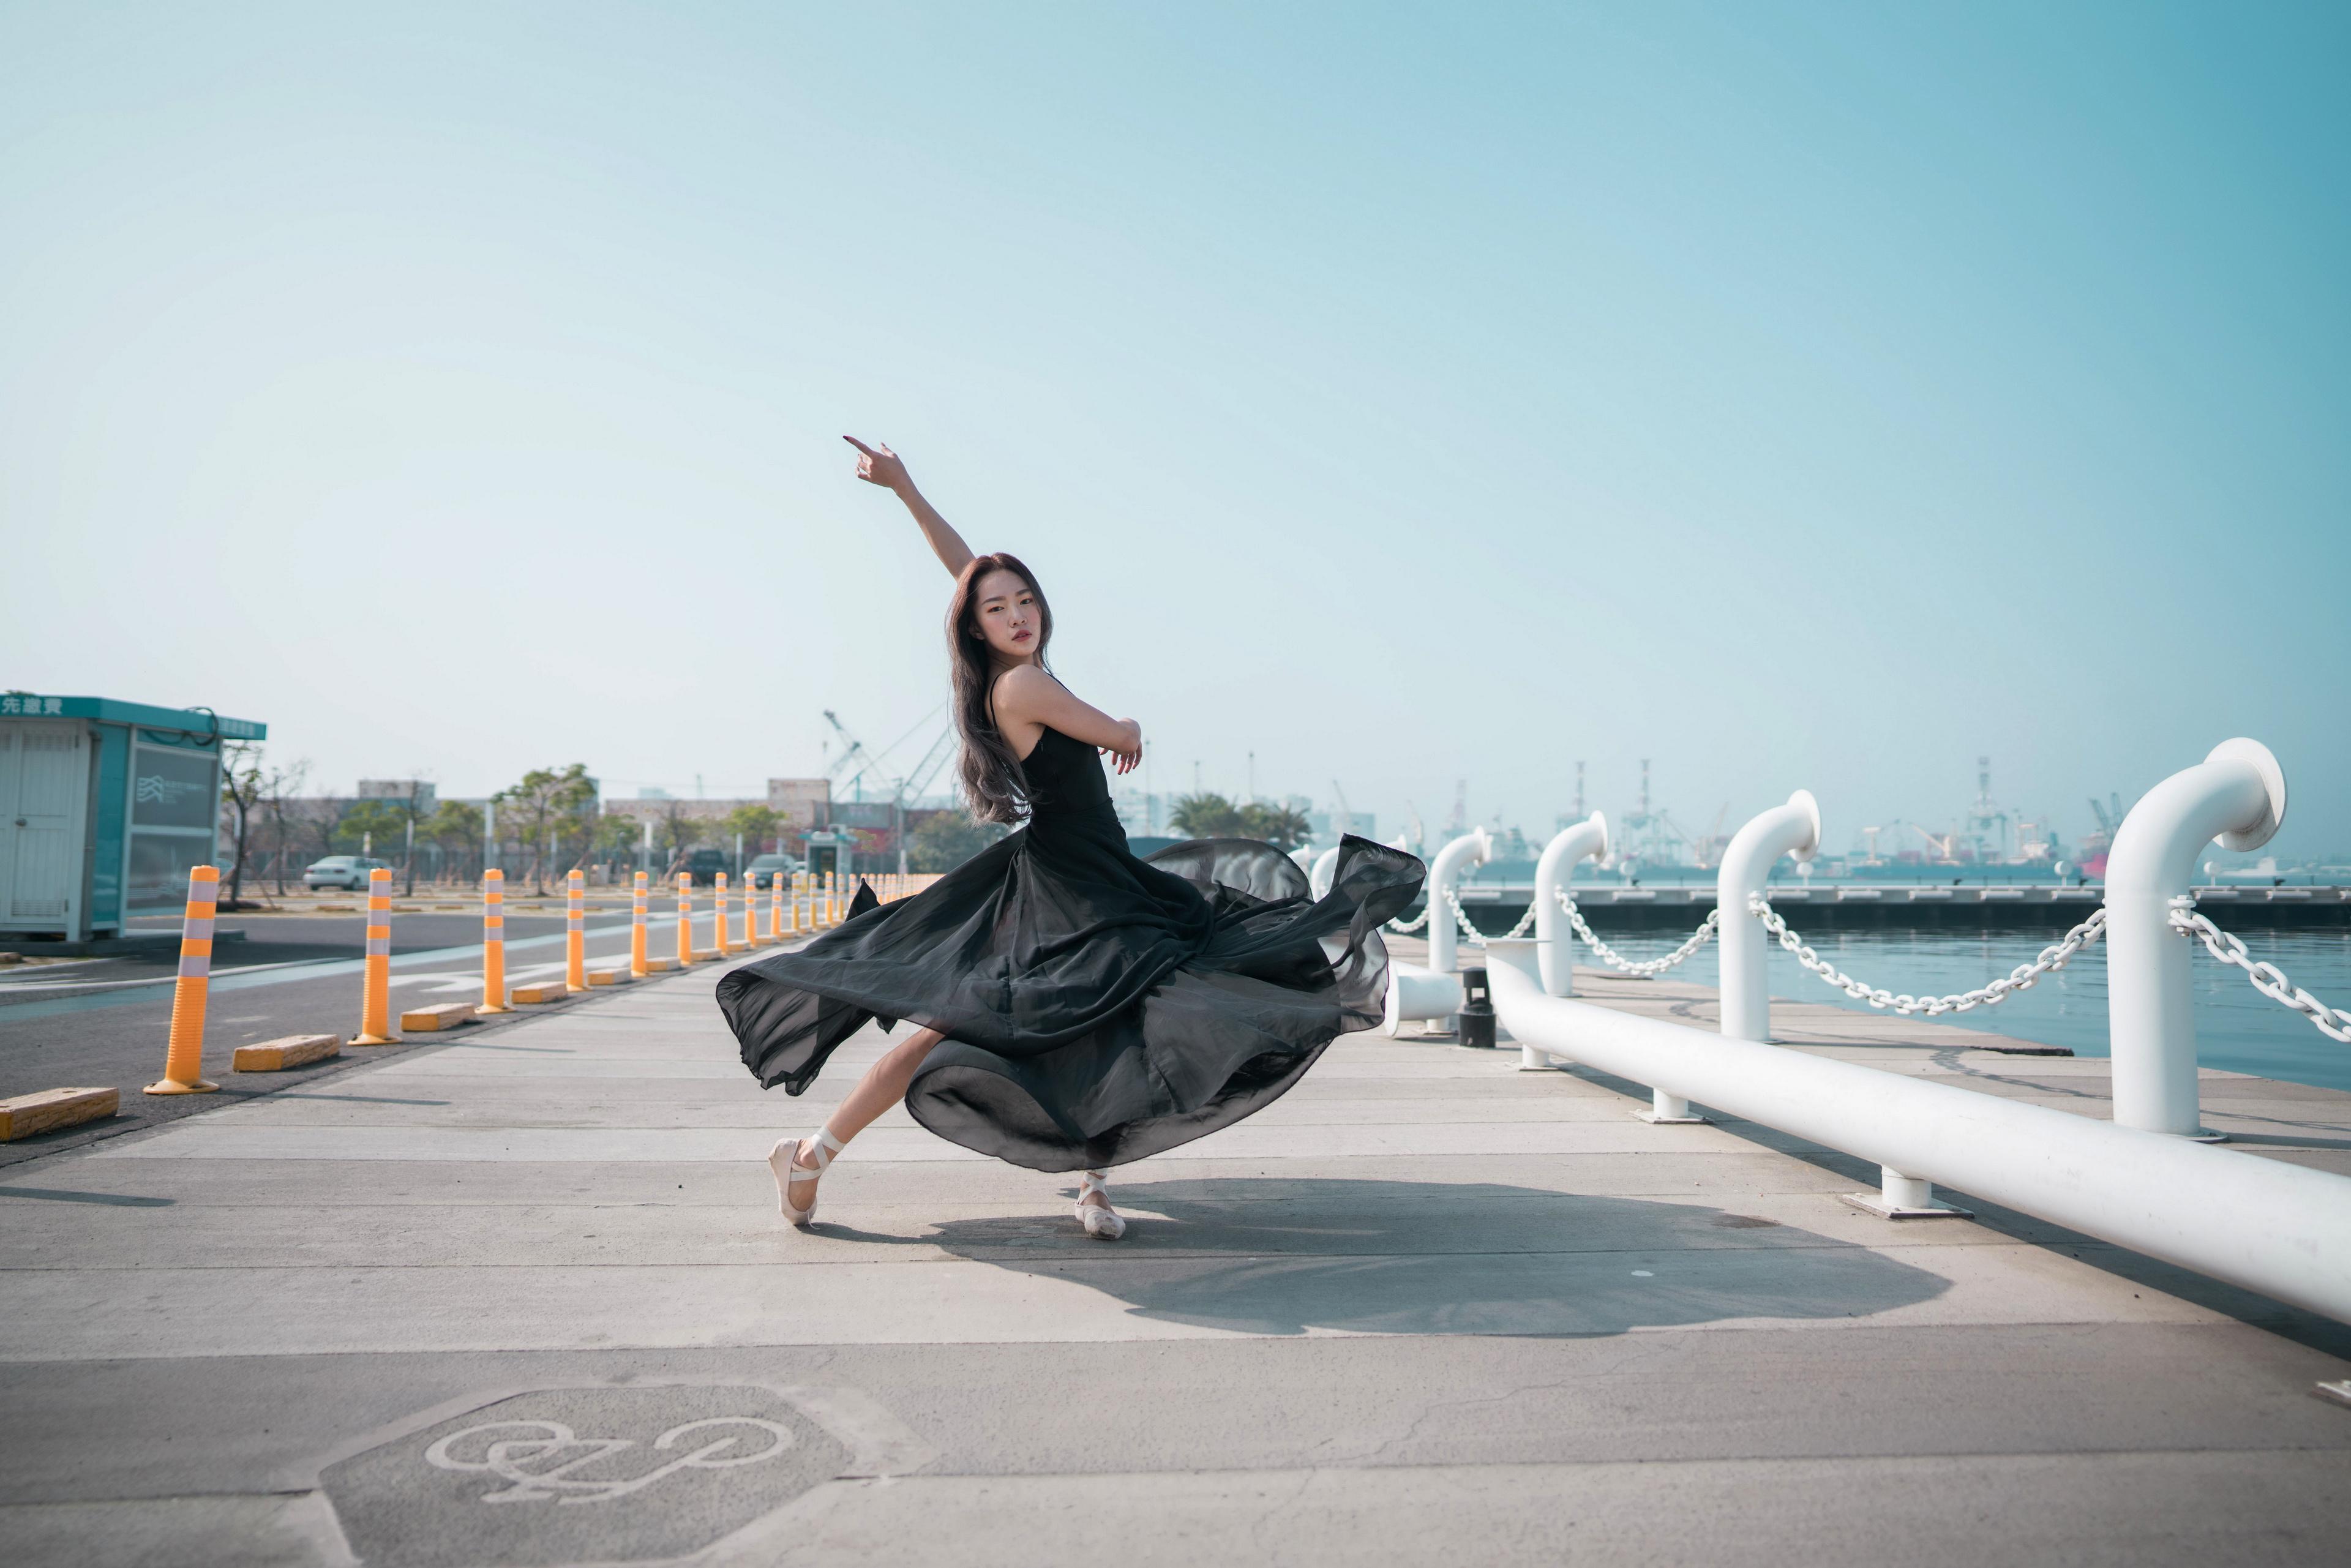 Wallpaper Ballet Dancing Girls Asiatic Waterfront Dress 3840x2561 Dance female young woman Asian gown frock